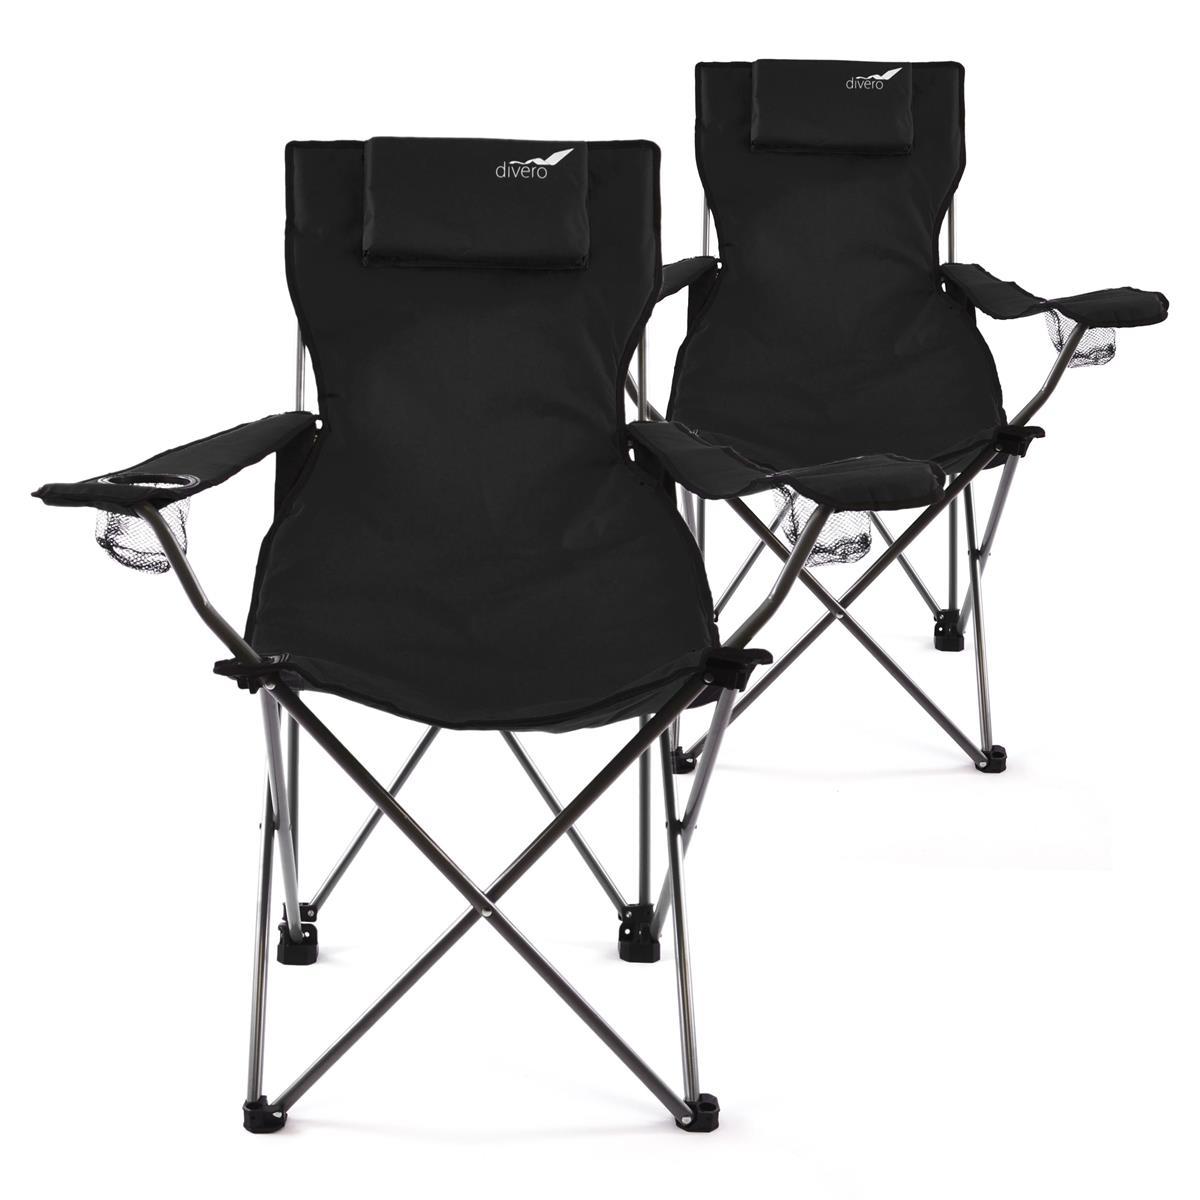 Divero 2er Set Camping Stuhl Faltstuhl Angelstuhl schwarz Kopfkissen robust